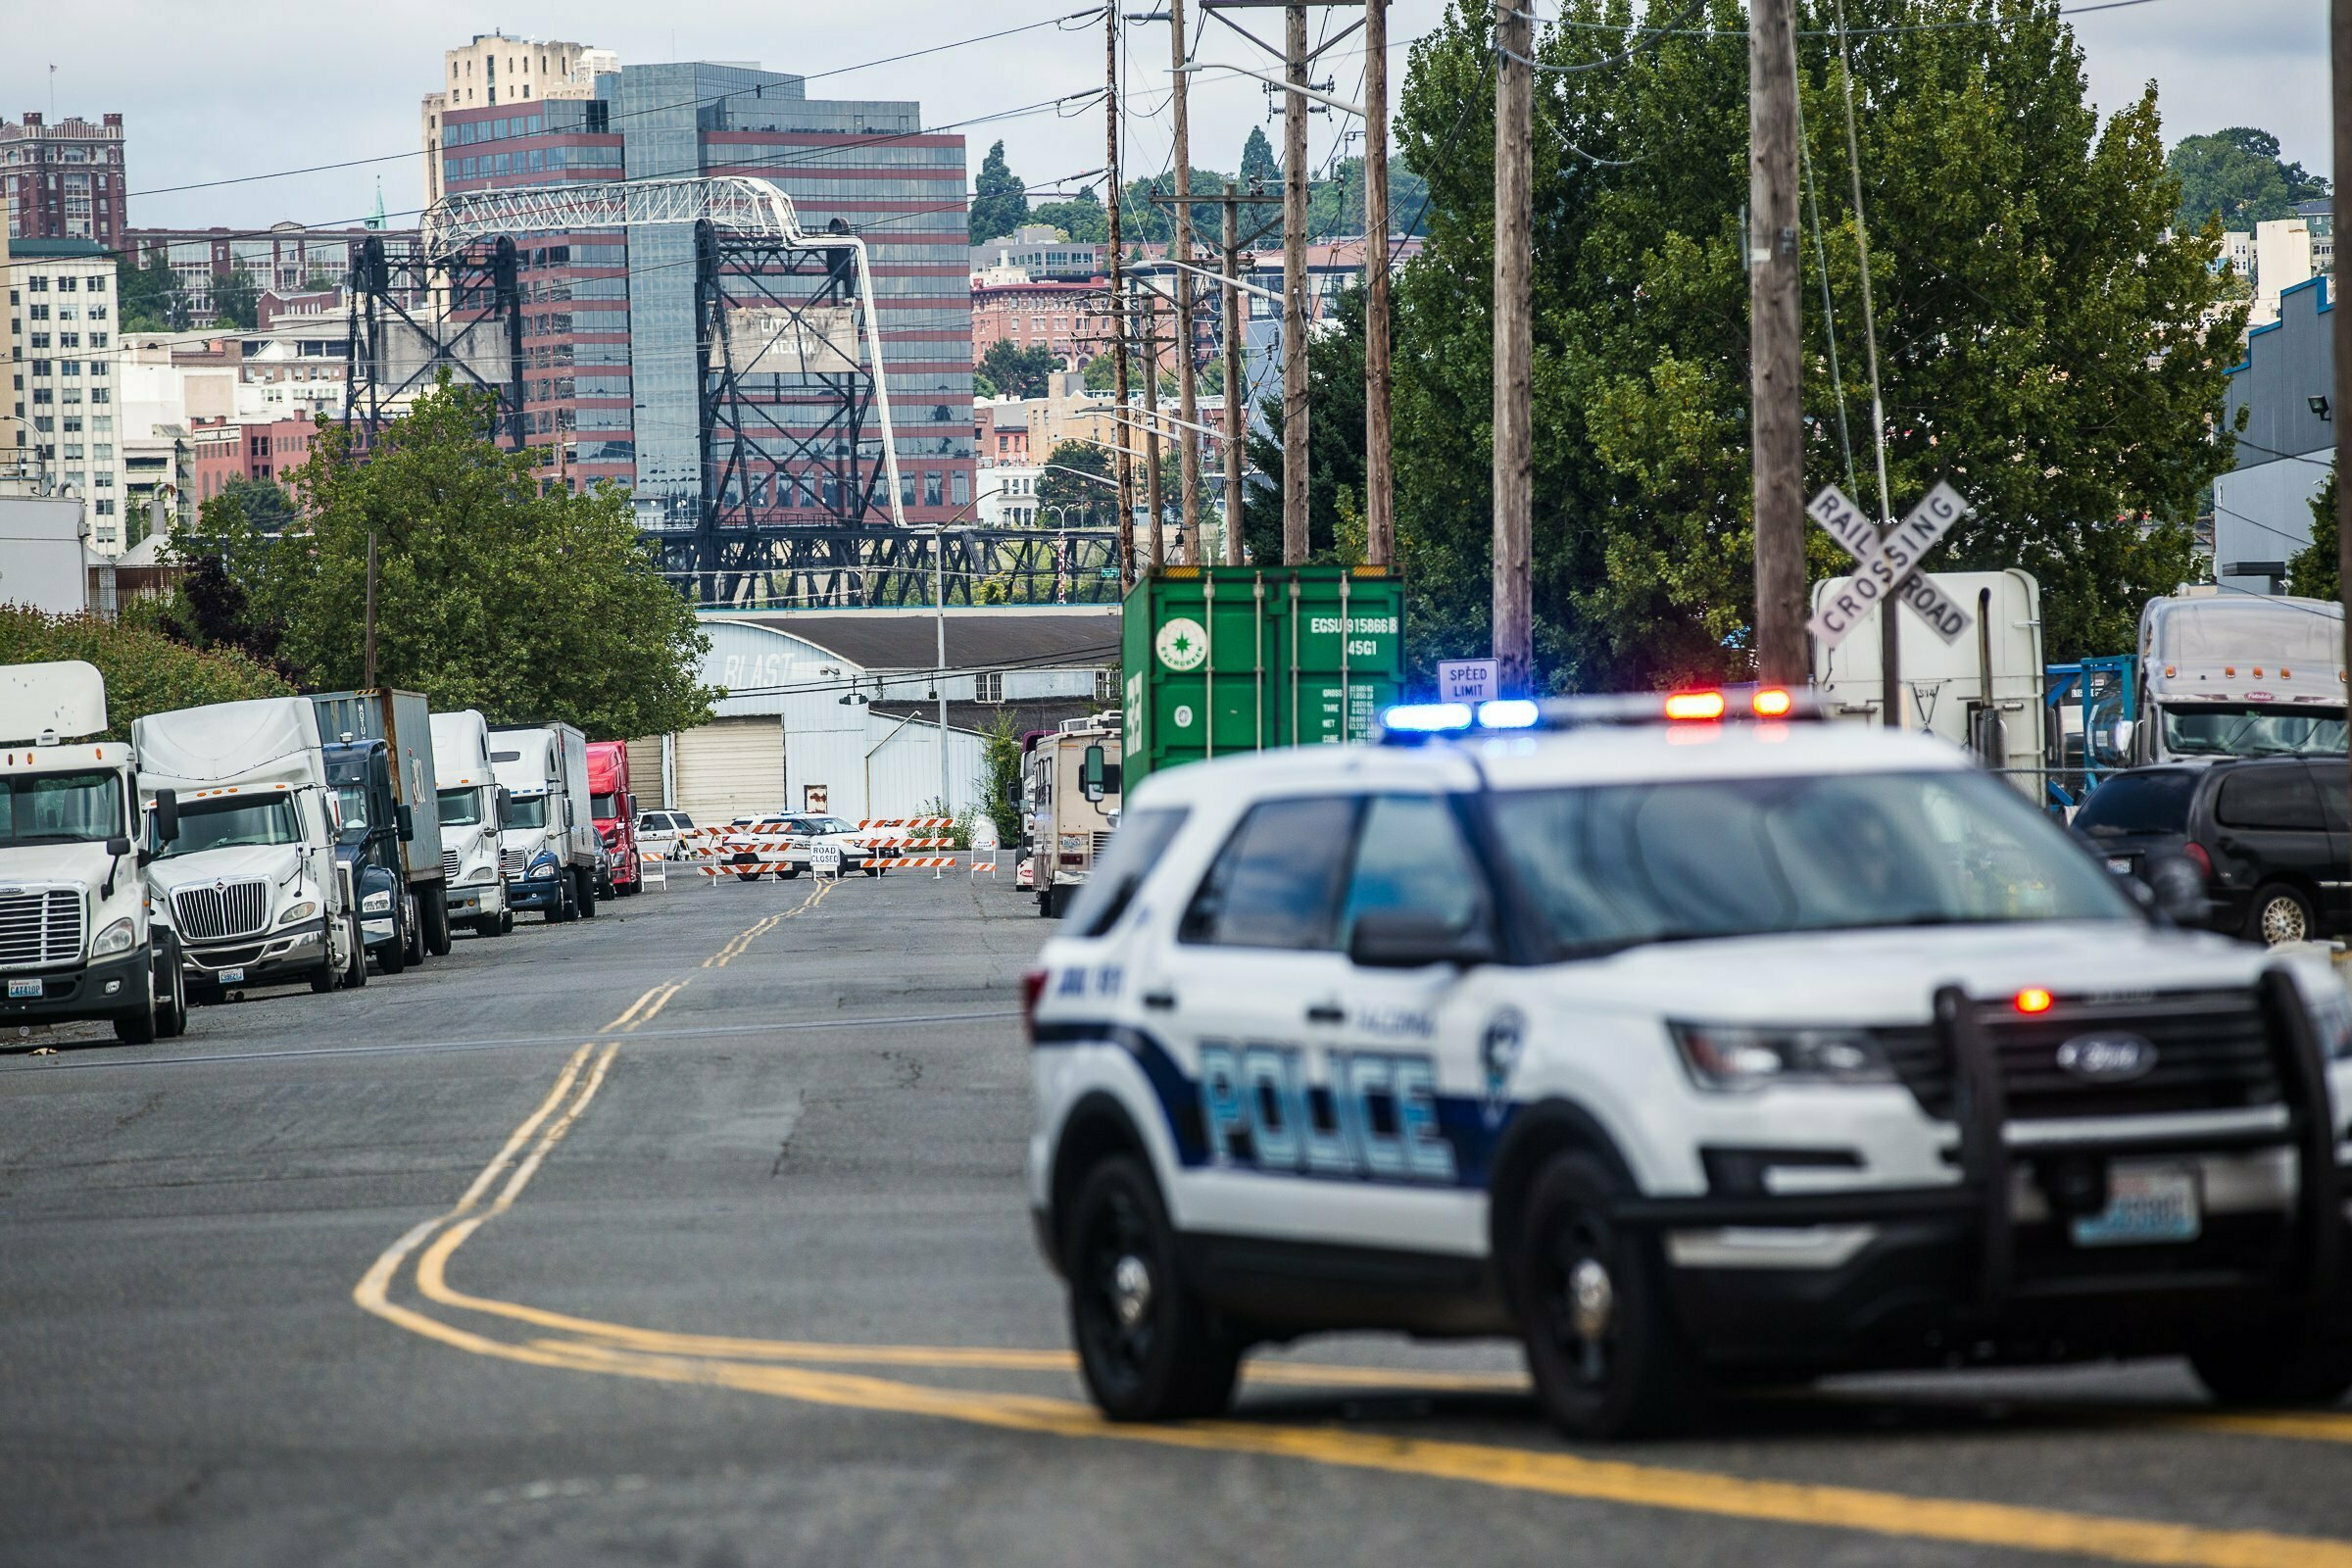 Demonstrators return to immigration jail after attack, death